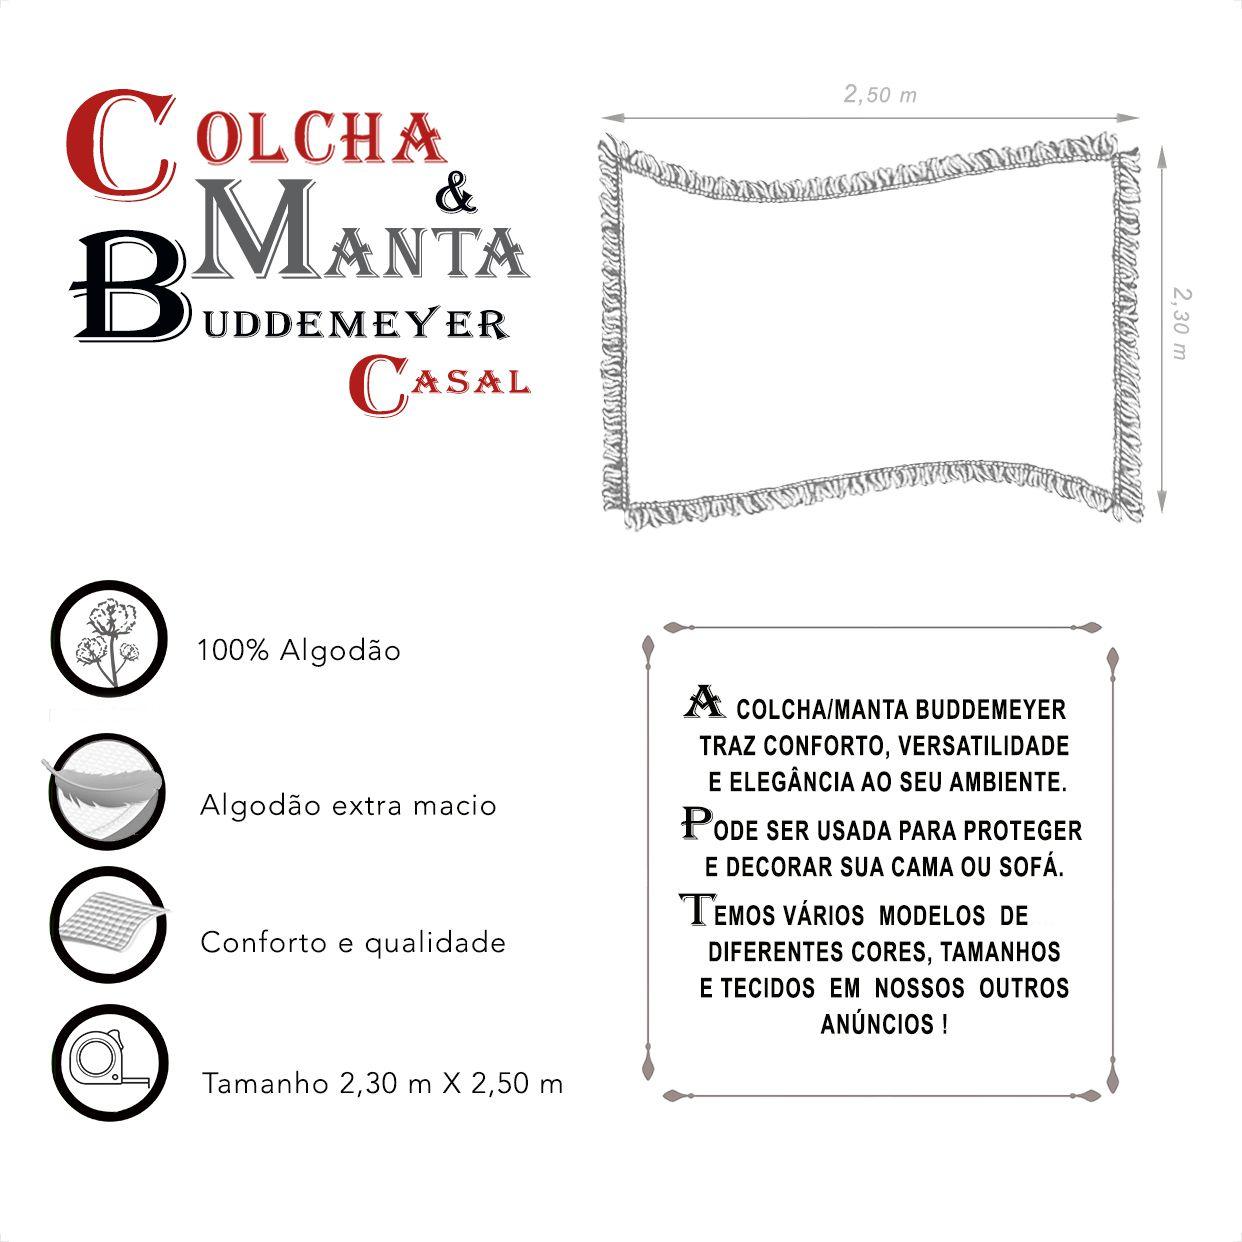 Manta e Colcha Buddemeyer Casal (2,30m x 2,50m)